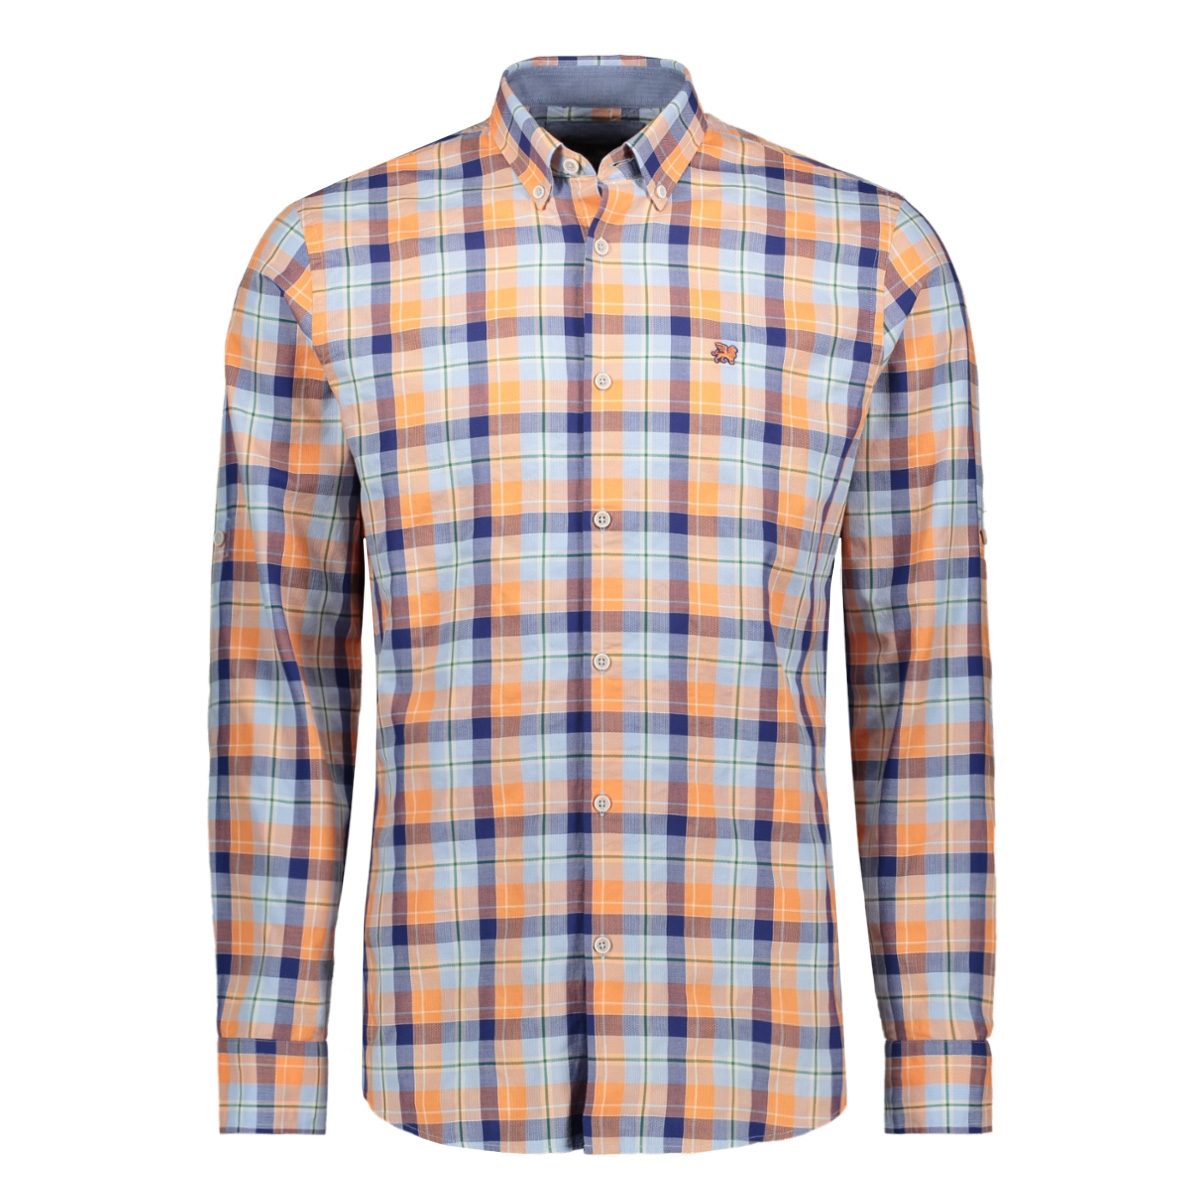 long sleeve shirt check crowan vsi202242 vanguard overhemd 2147